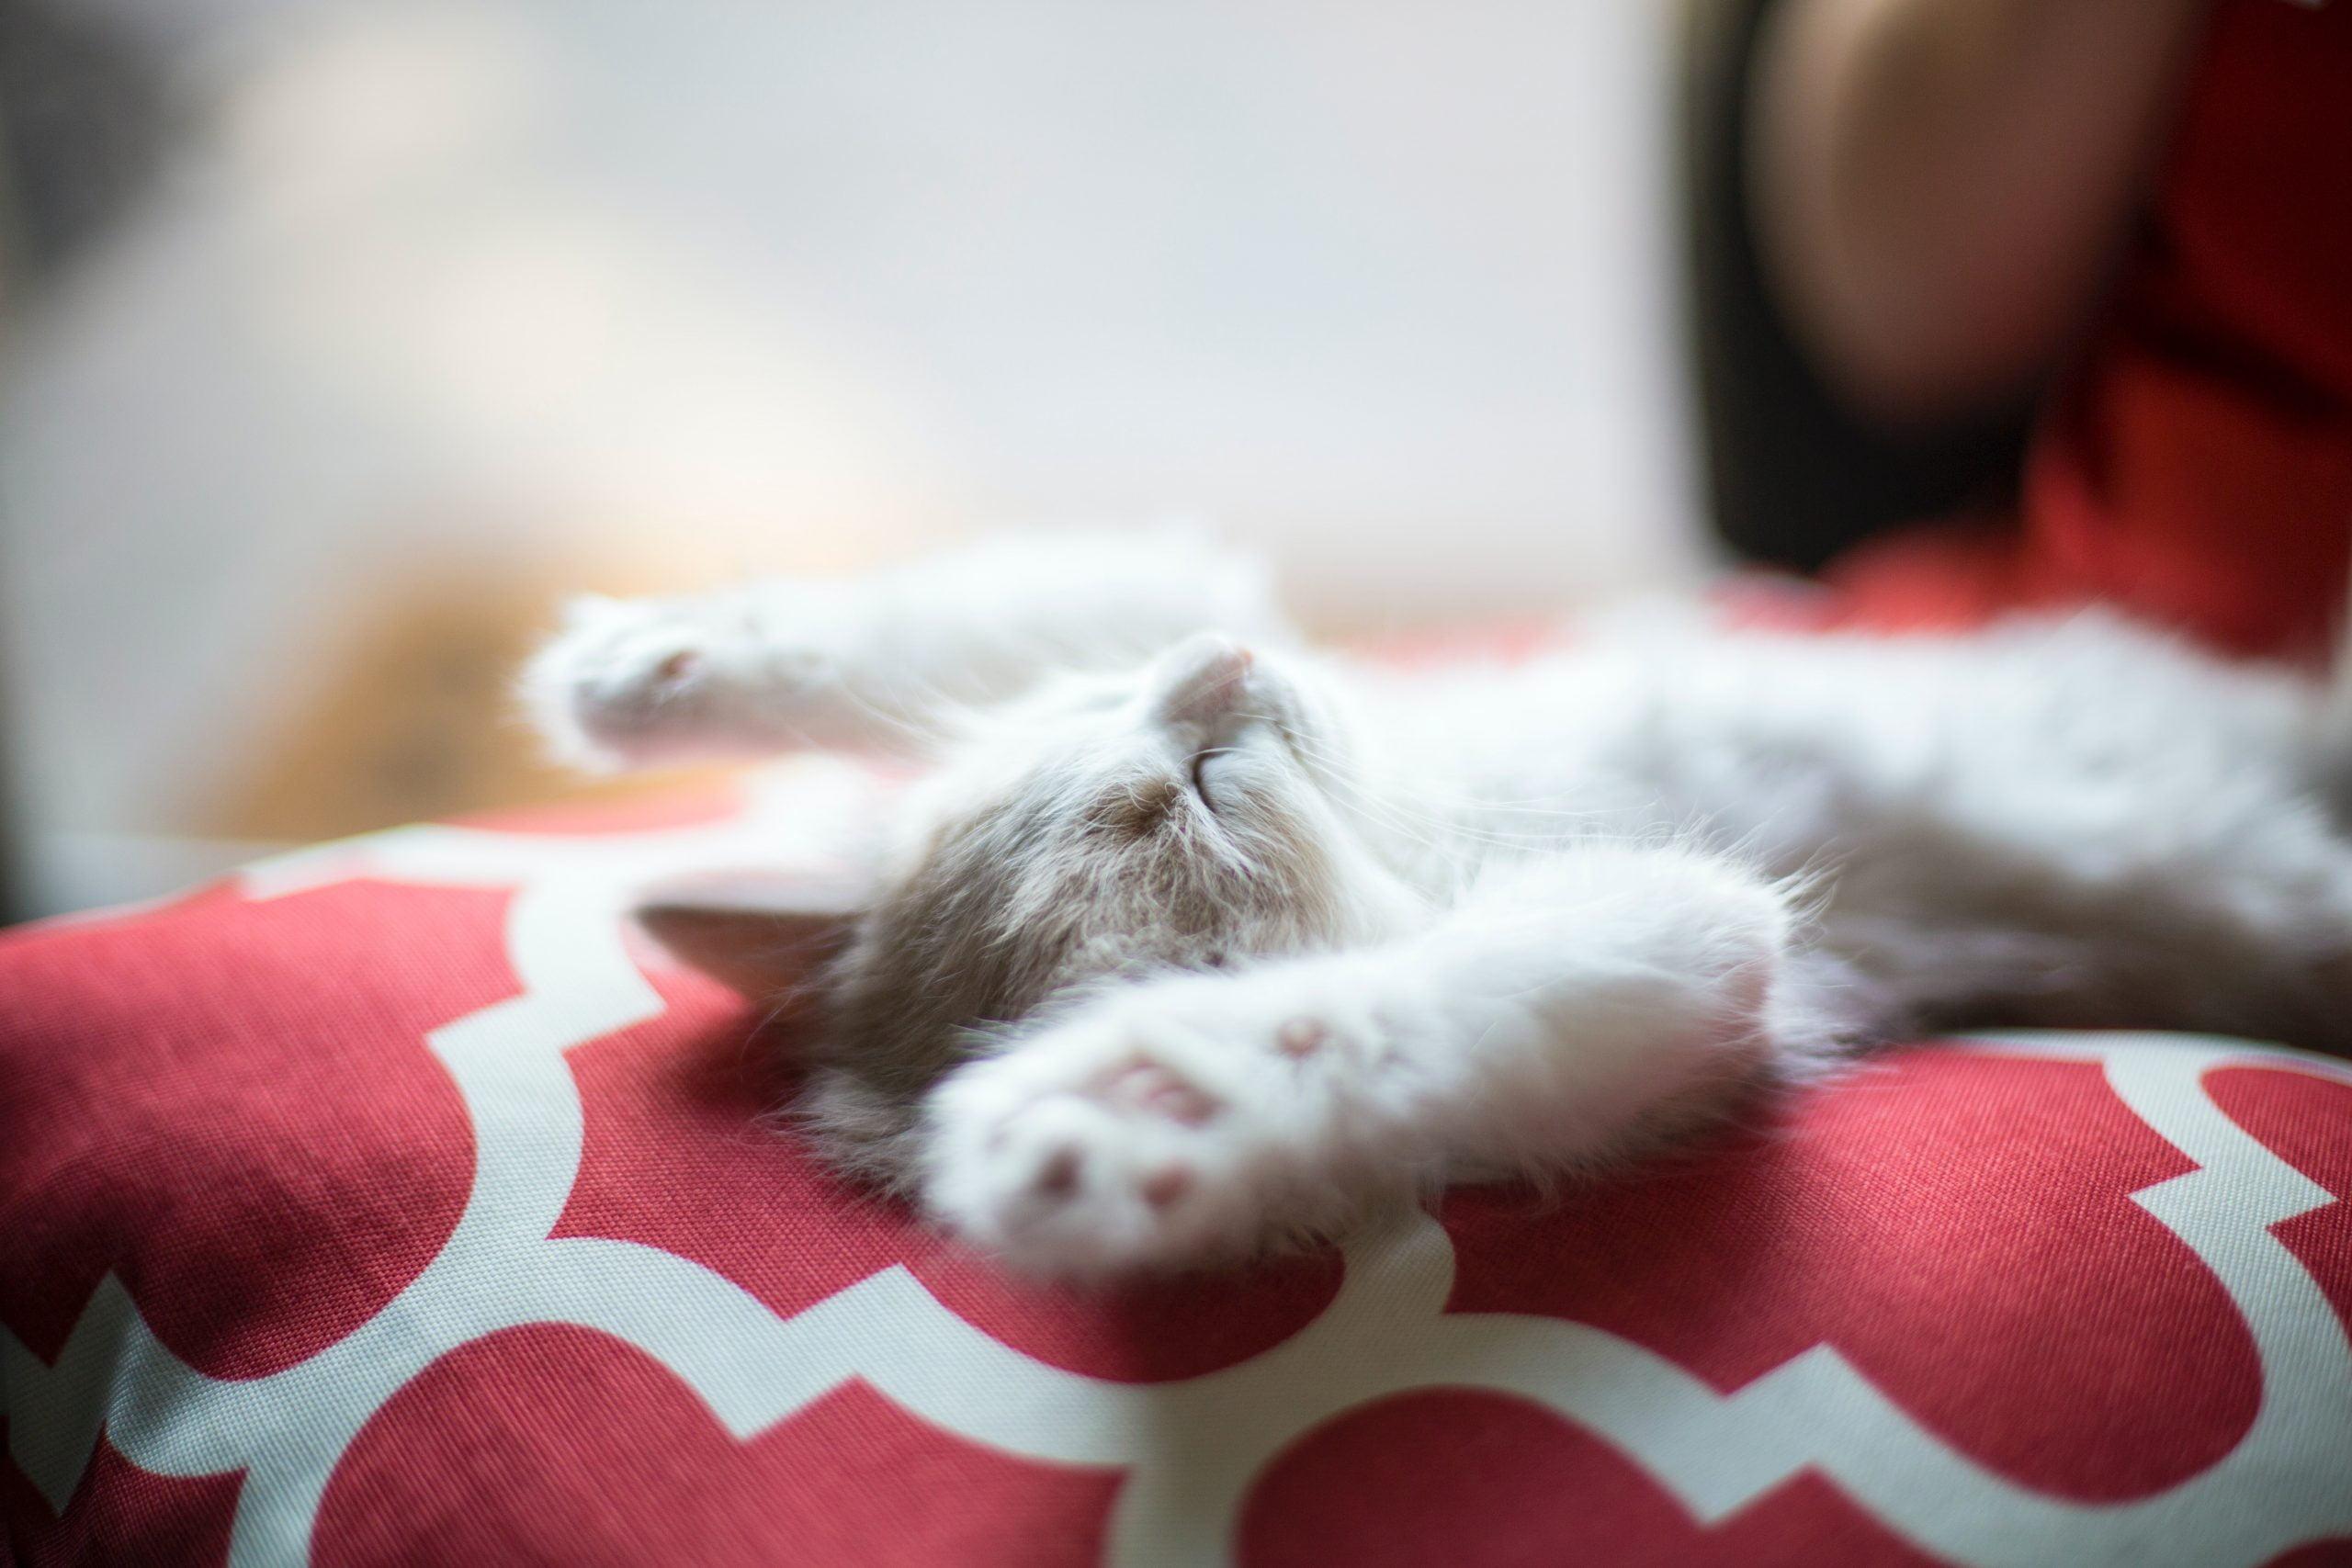 Las mejores golosinas relajantes para gatos [year] (análisis) 1